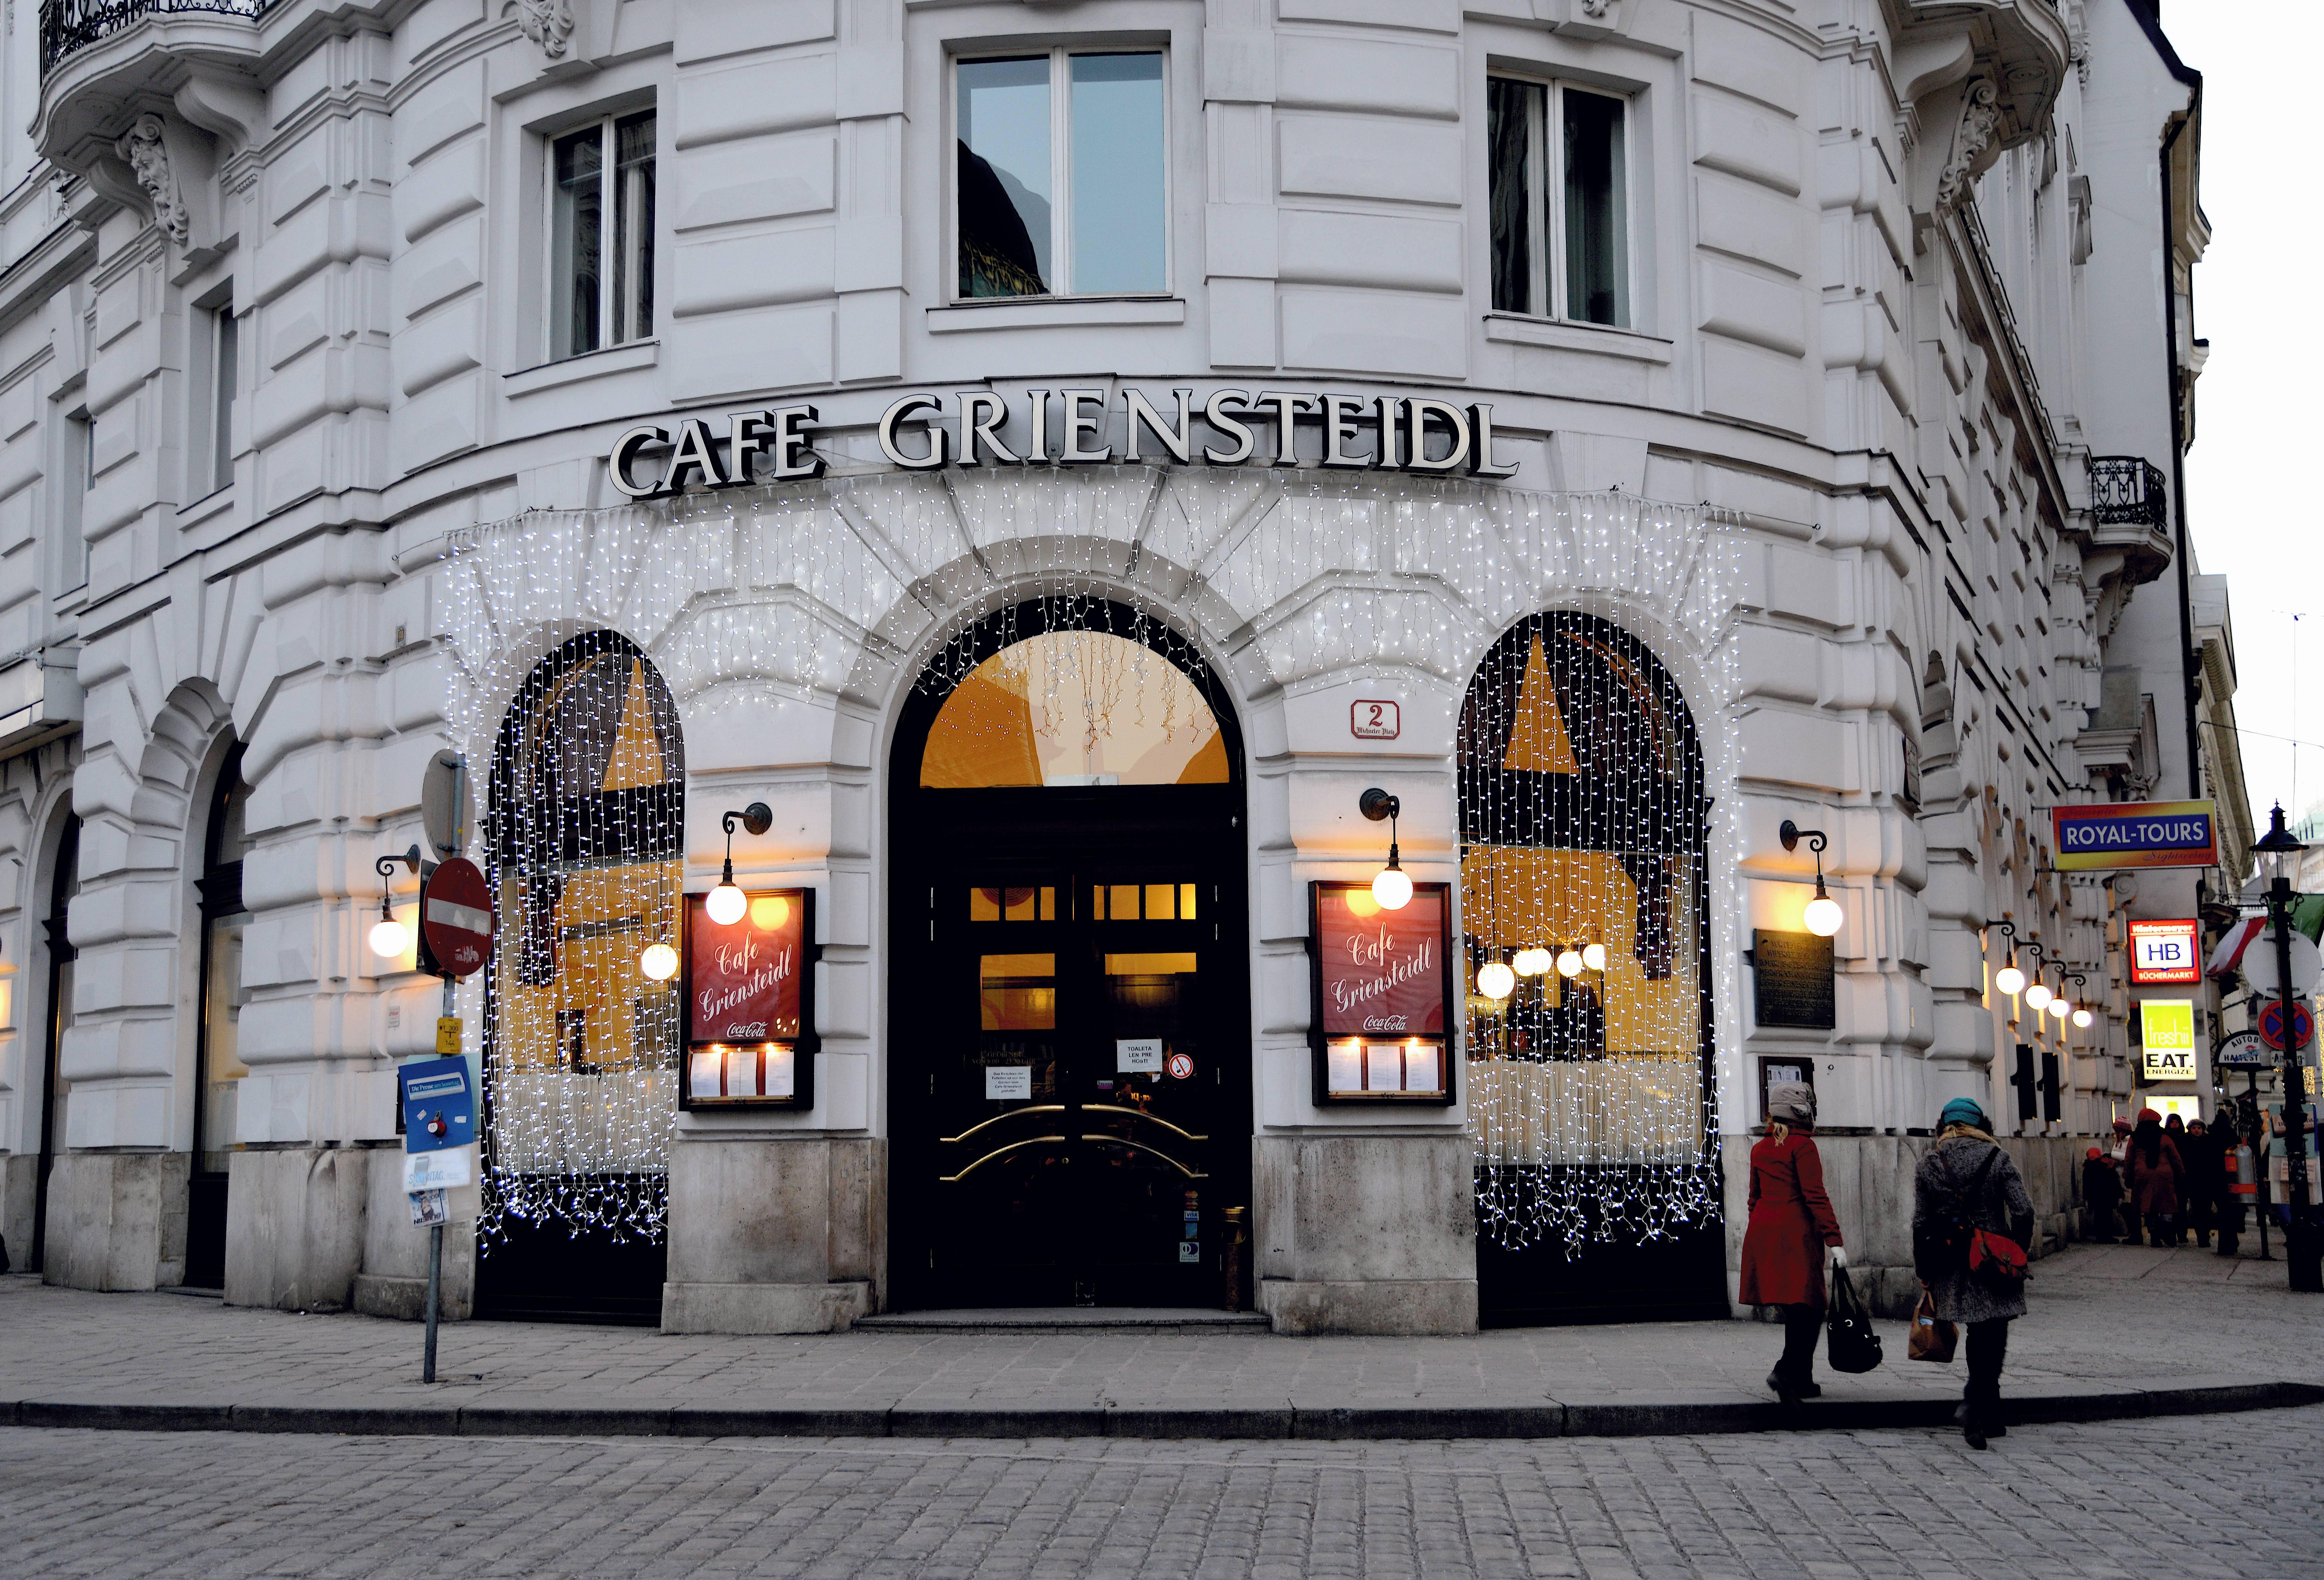 Http Www Cafe Und Pension Alte Messe De